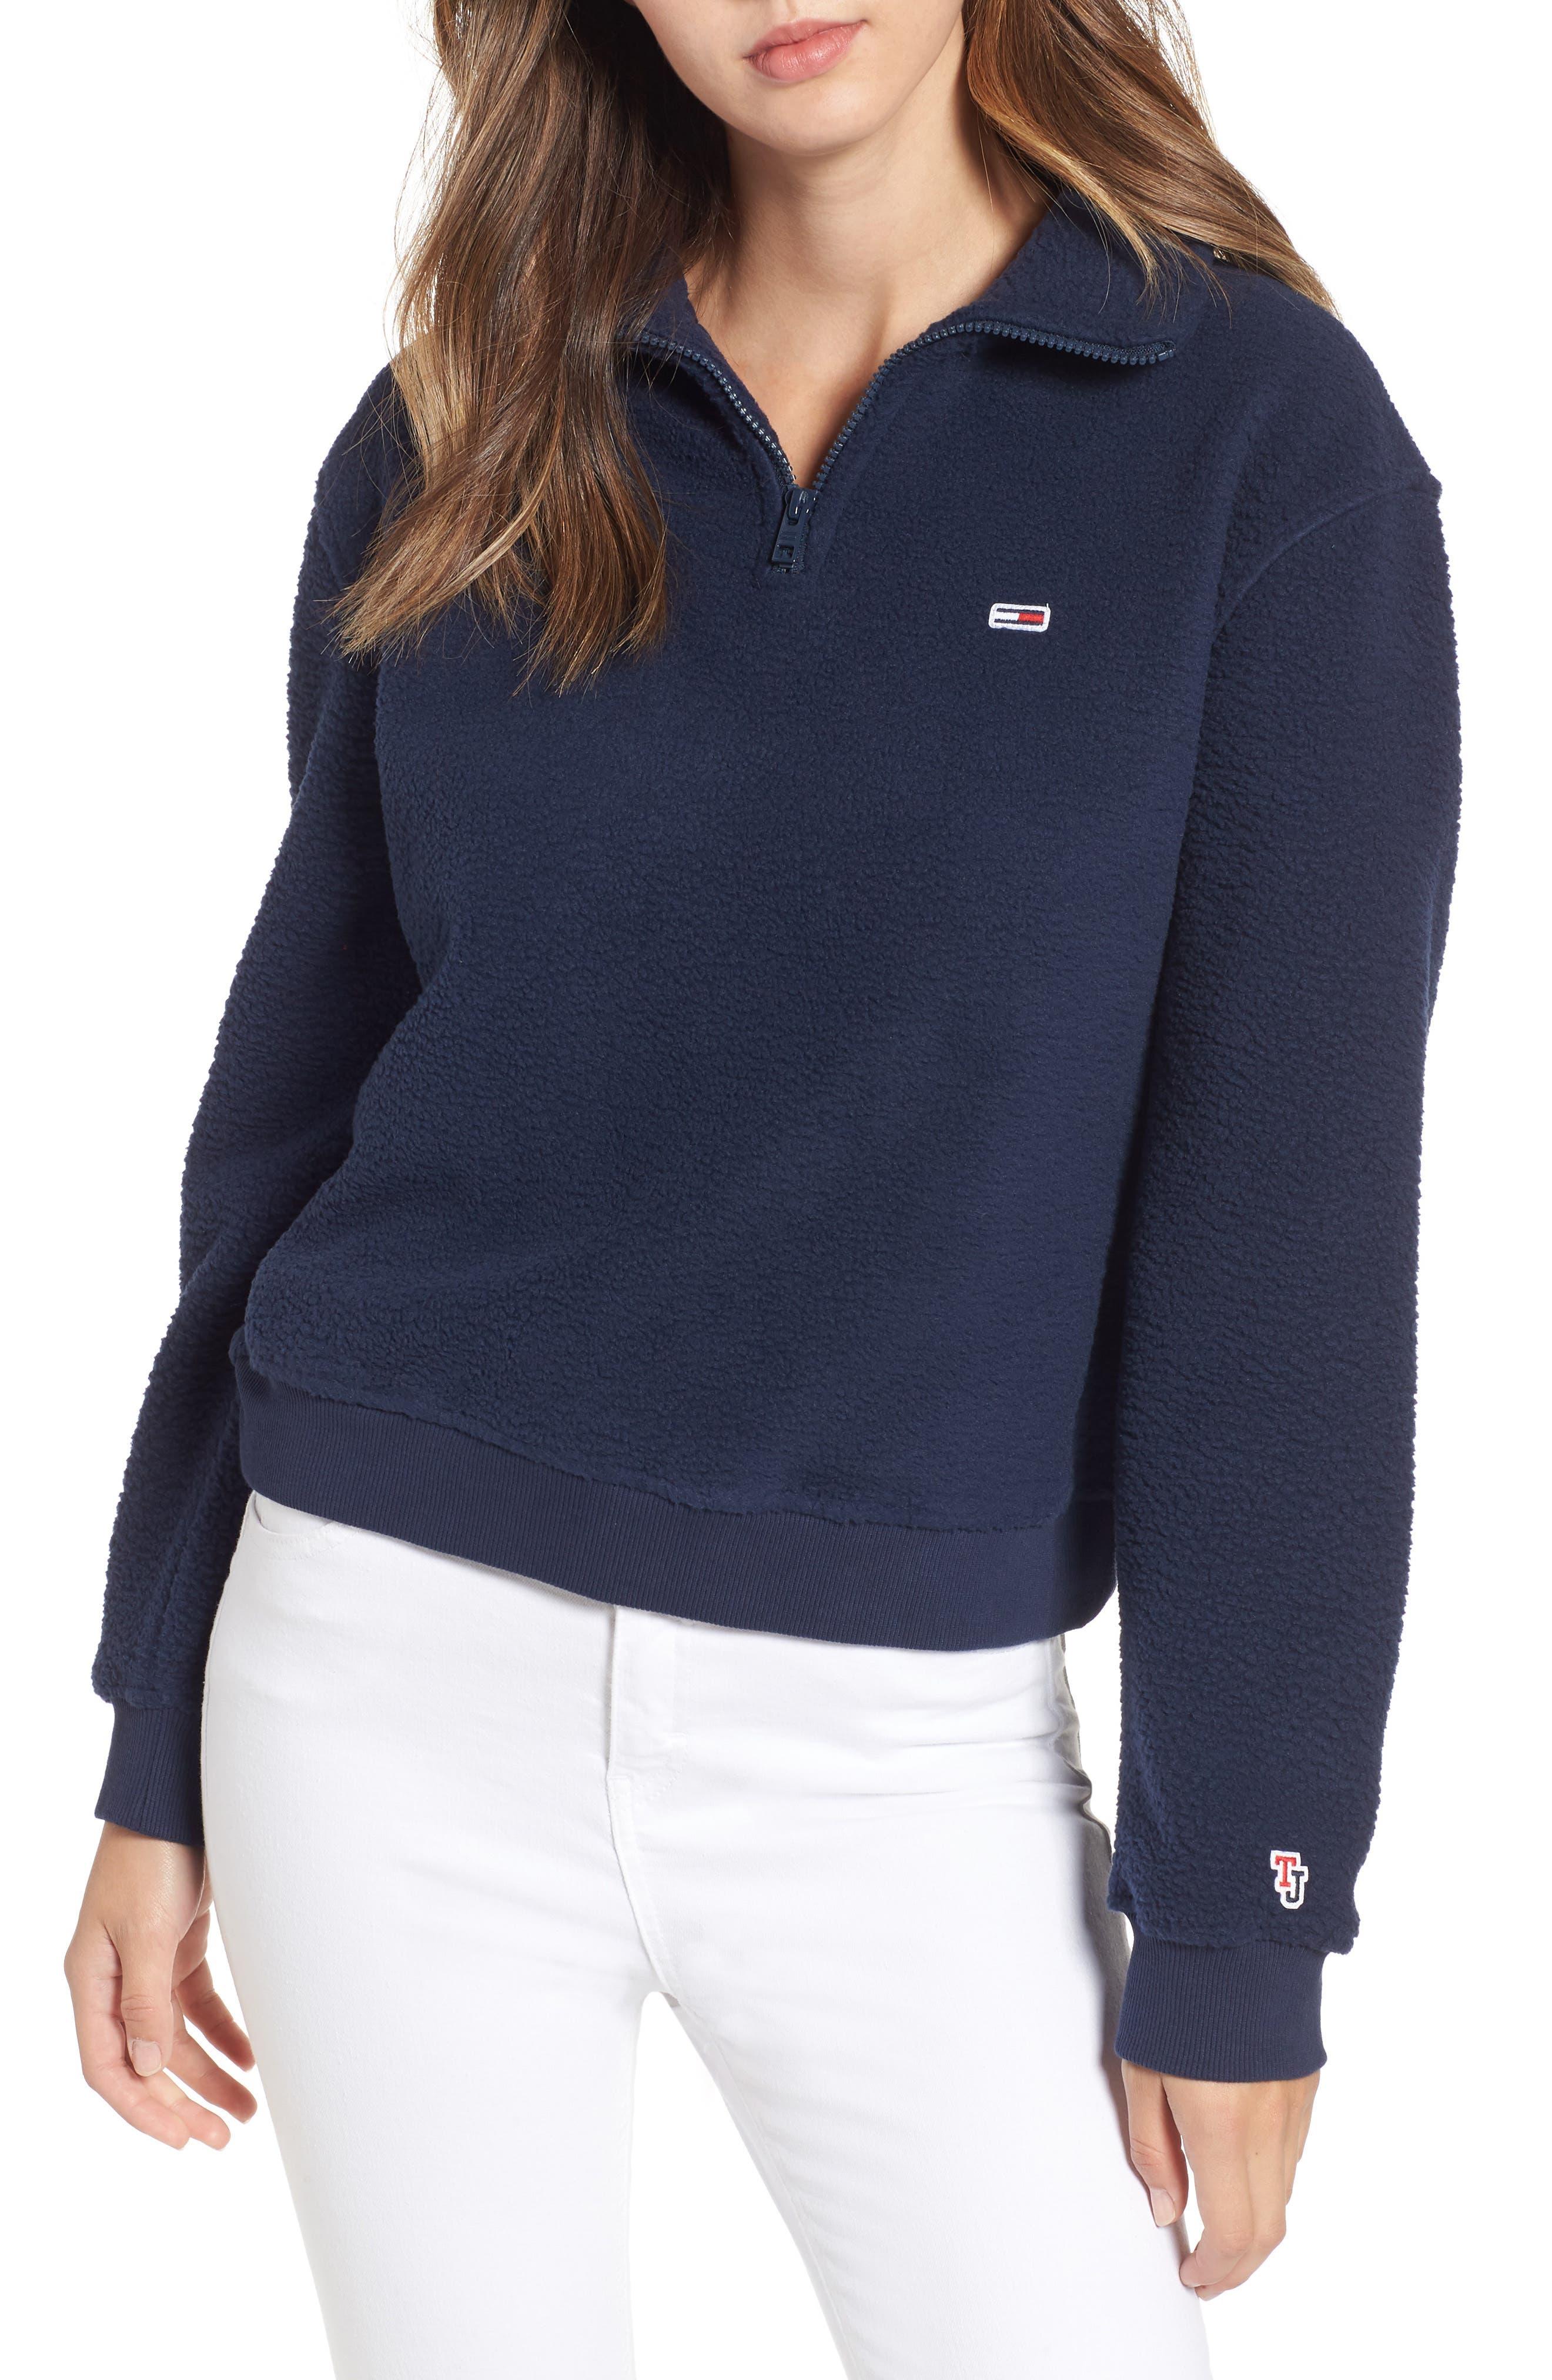 TJW Classics Polar Fleece Sweatshirt,                         Main,                         color, 002